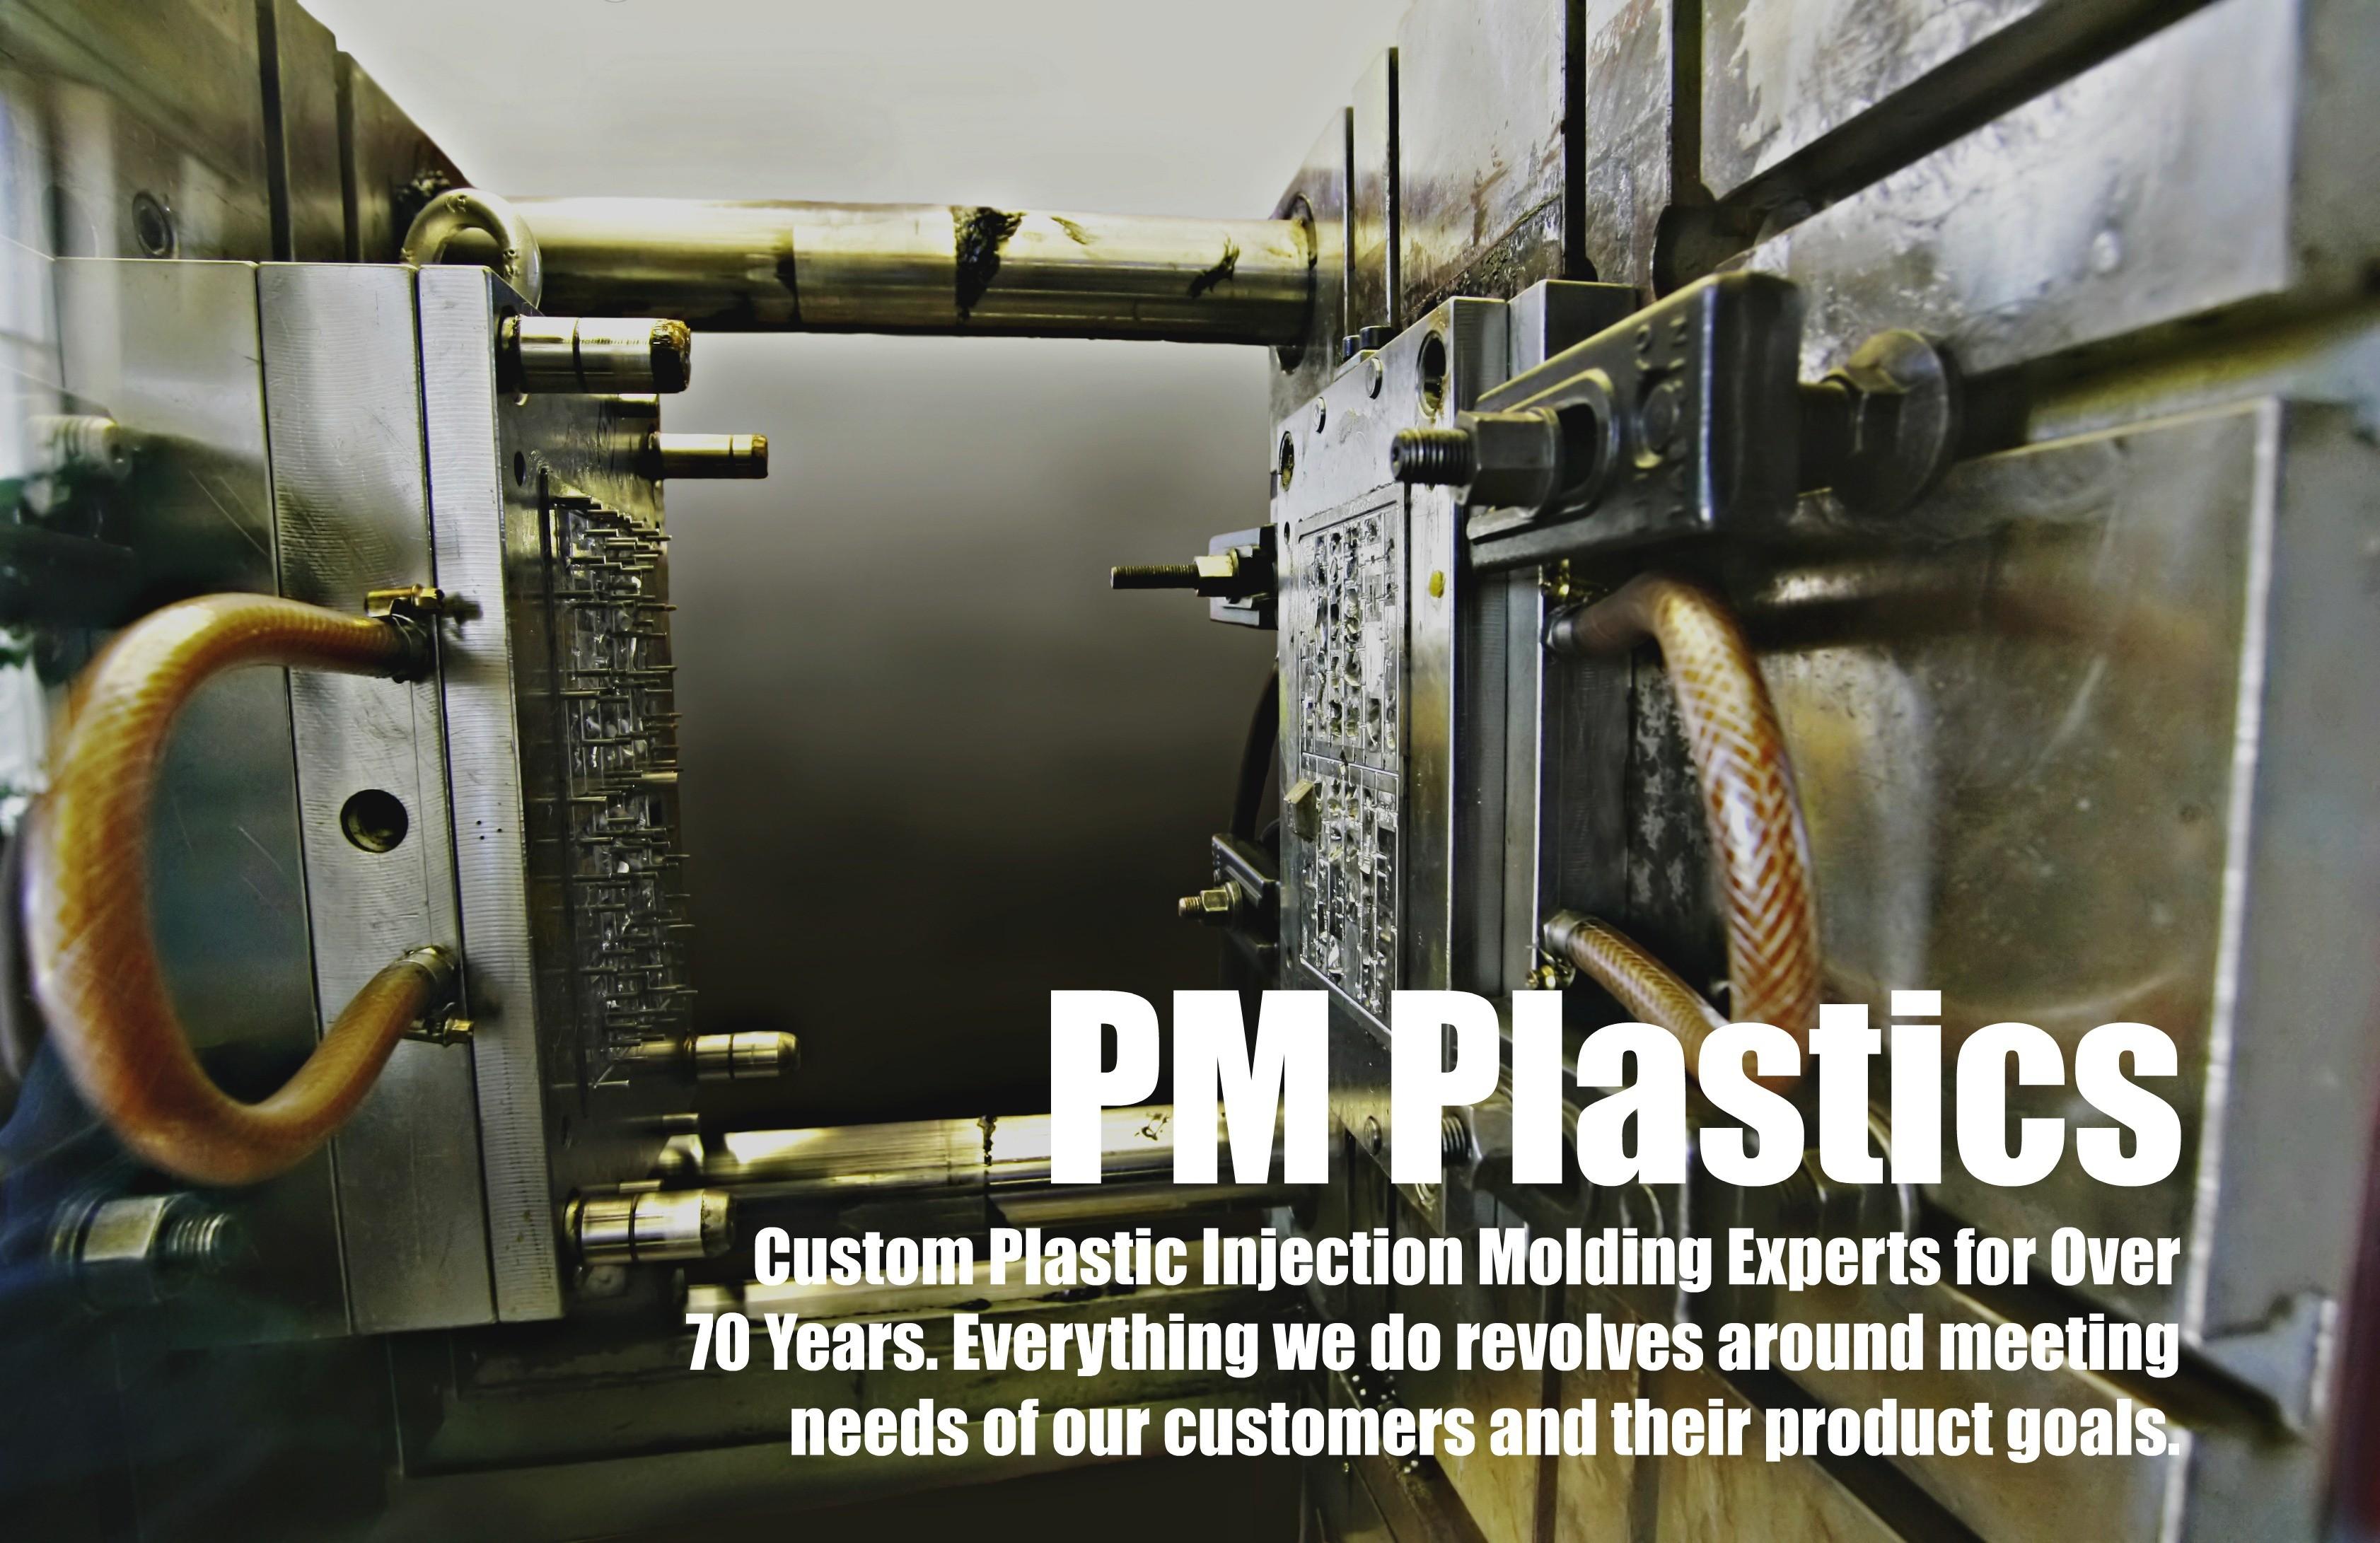 PM Plastics - High Volume Plastic Injection Molding Experts